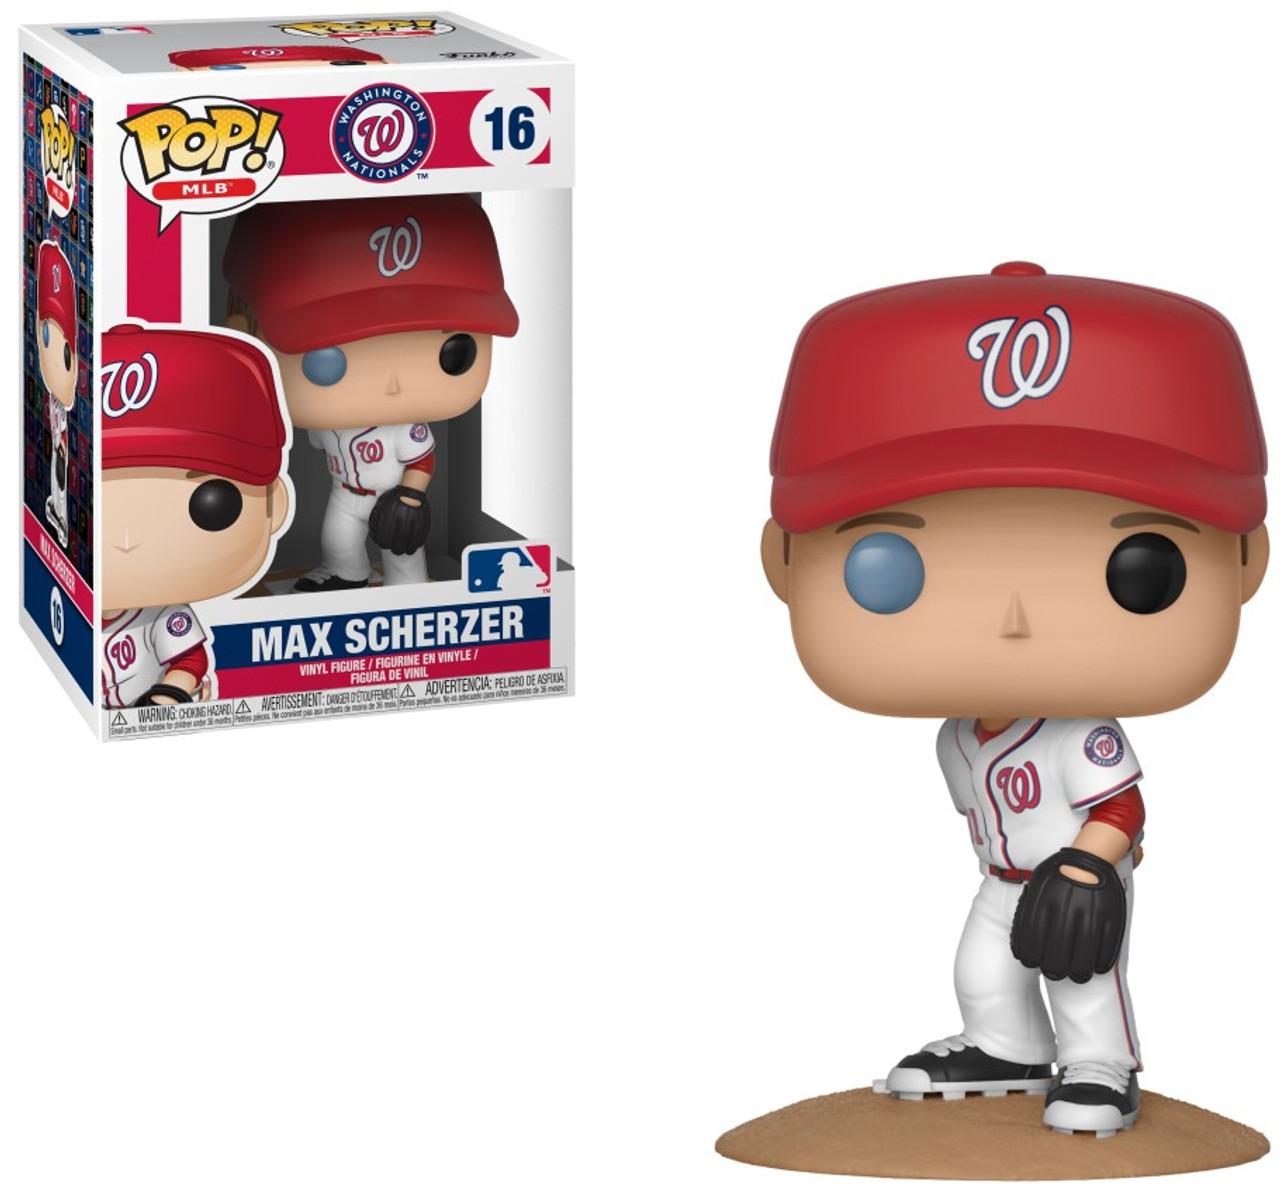 39376e39658 Funko Major League Baseball Washington Nationals Funko POP MLB Max Scherzer Vinyl  Figure 16 - ToyWiz